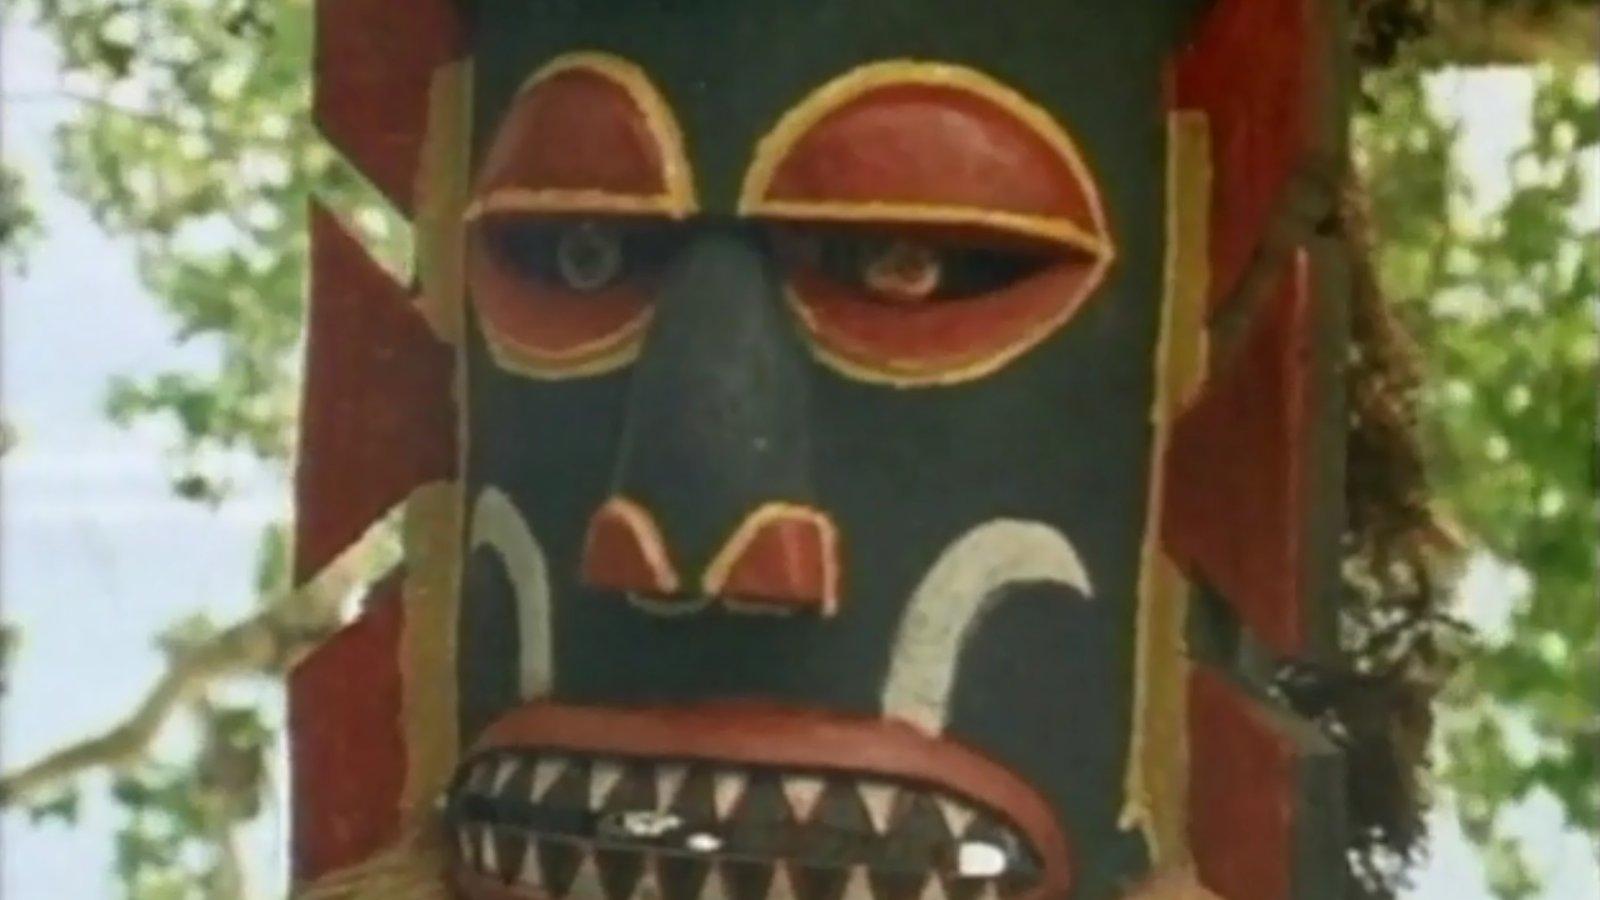 Malagan Labadama: A Tribute to Buk-Buk